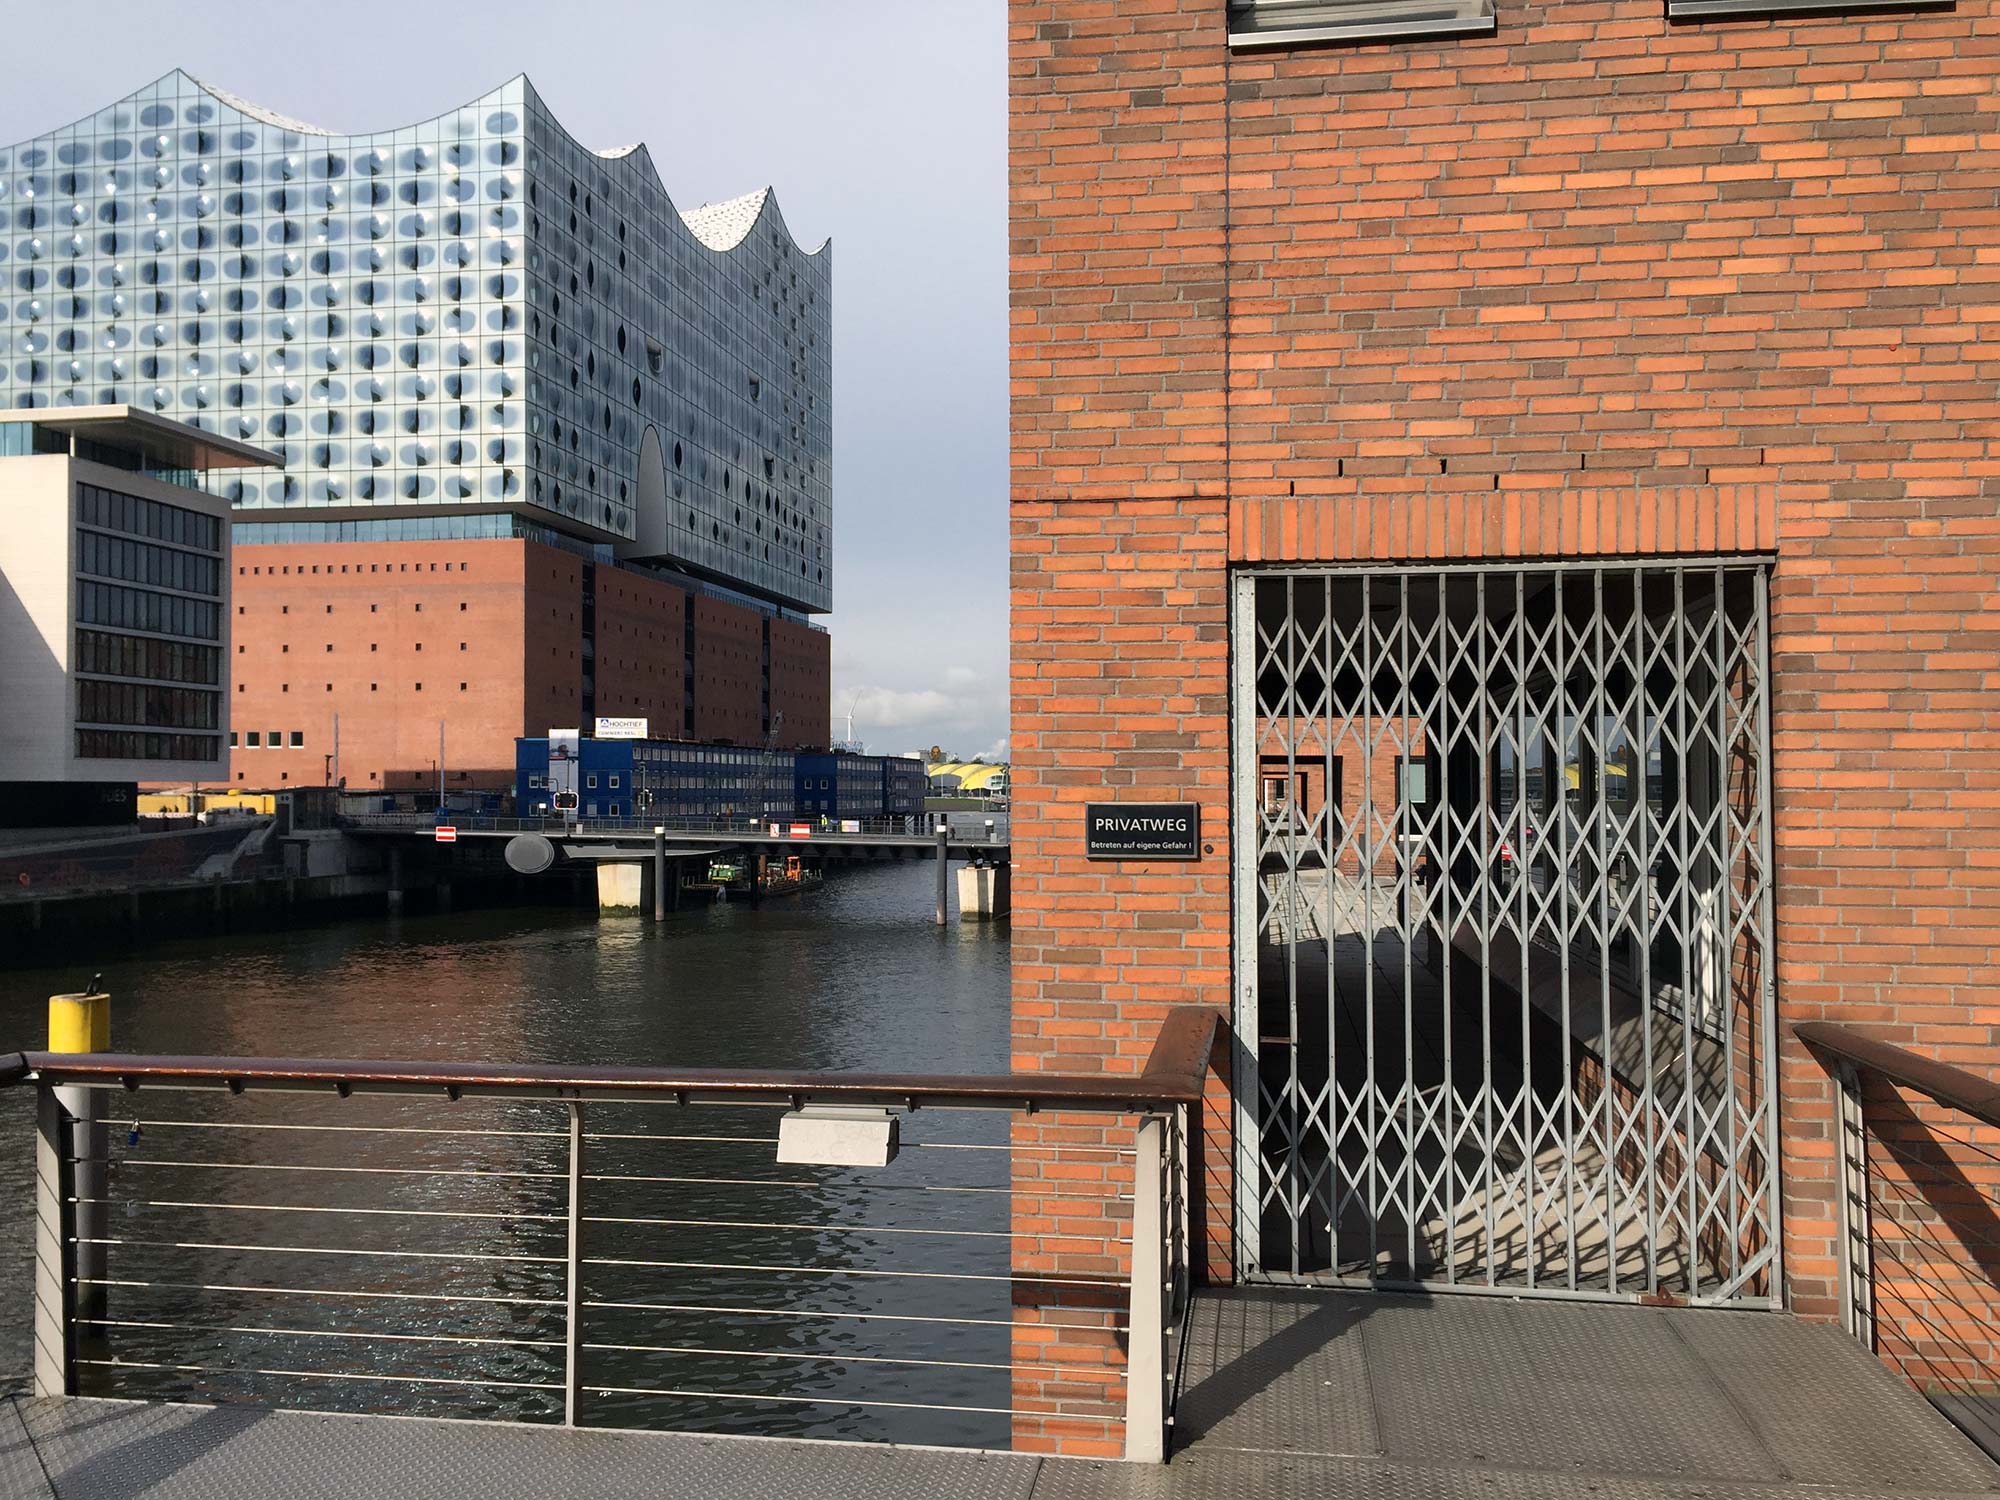 Herzog & deMeuron's Elbphilharmonie, built over an existing warehouse building is the new centerpiece of the Sandtorhafen docks.